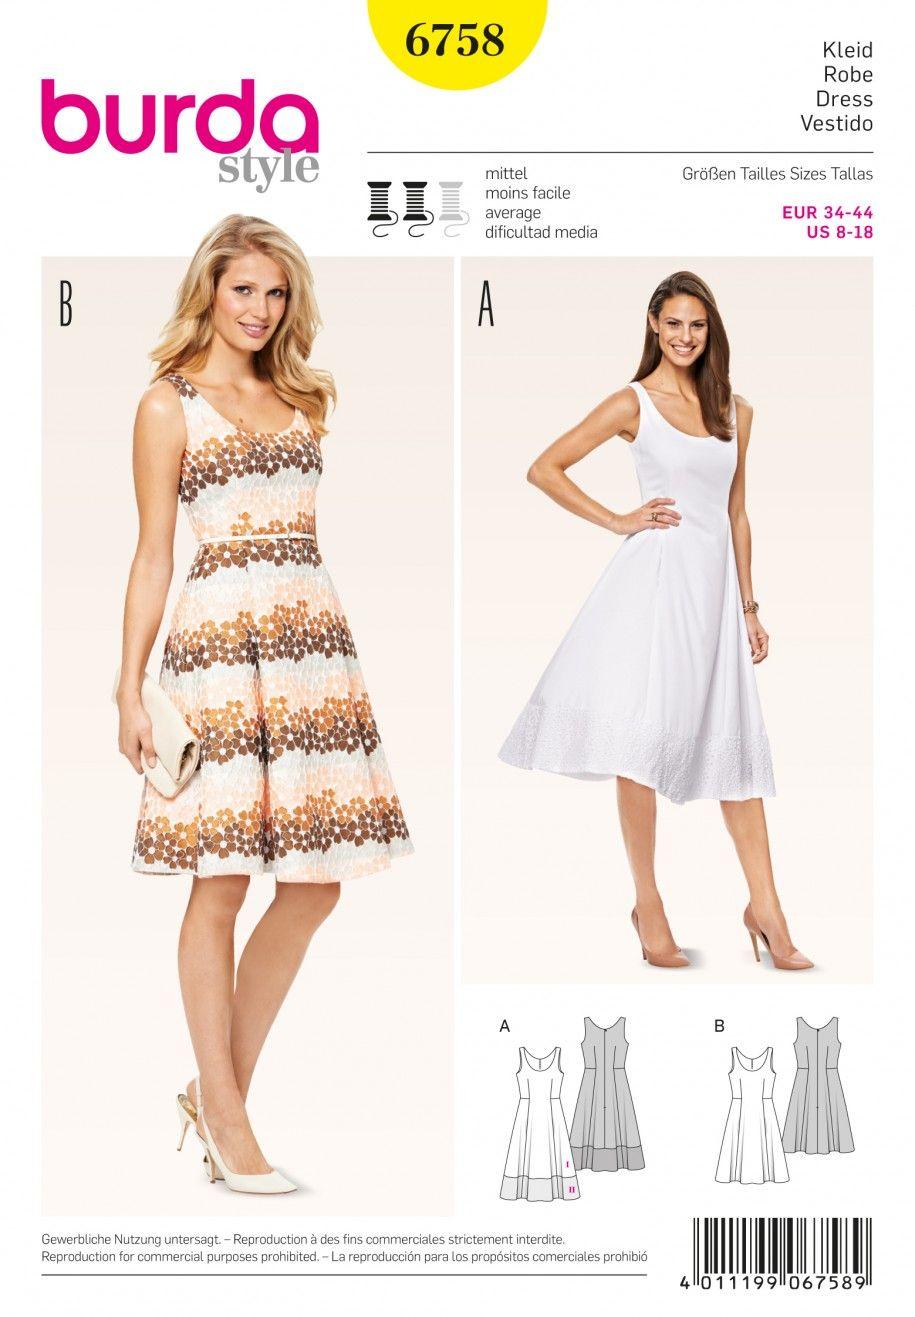 Burda B6758 Dresses Sewing Pattern | Kleider